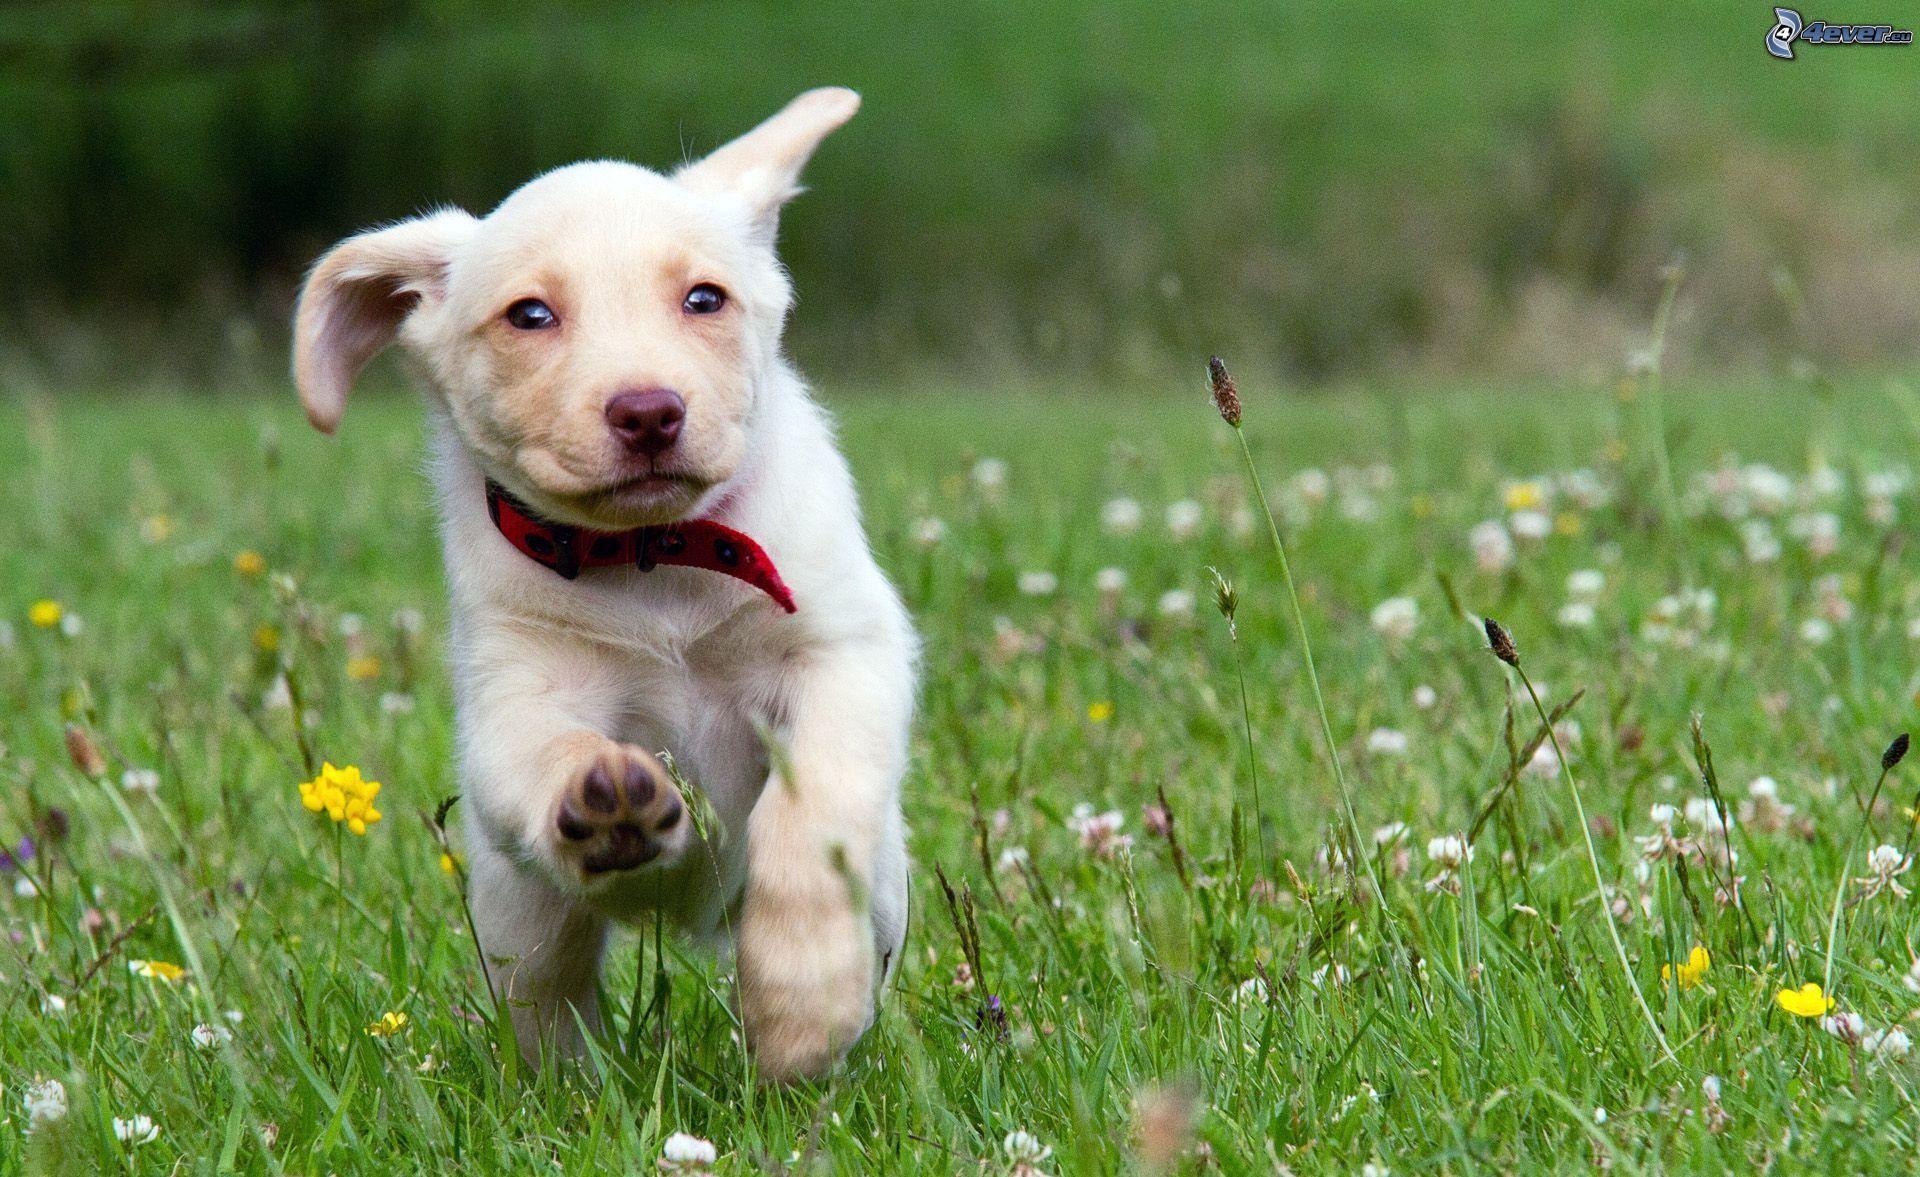 Síntomas del síndrome de Pelger Huet en perros